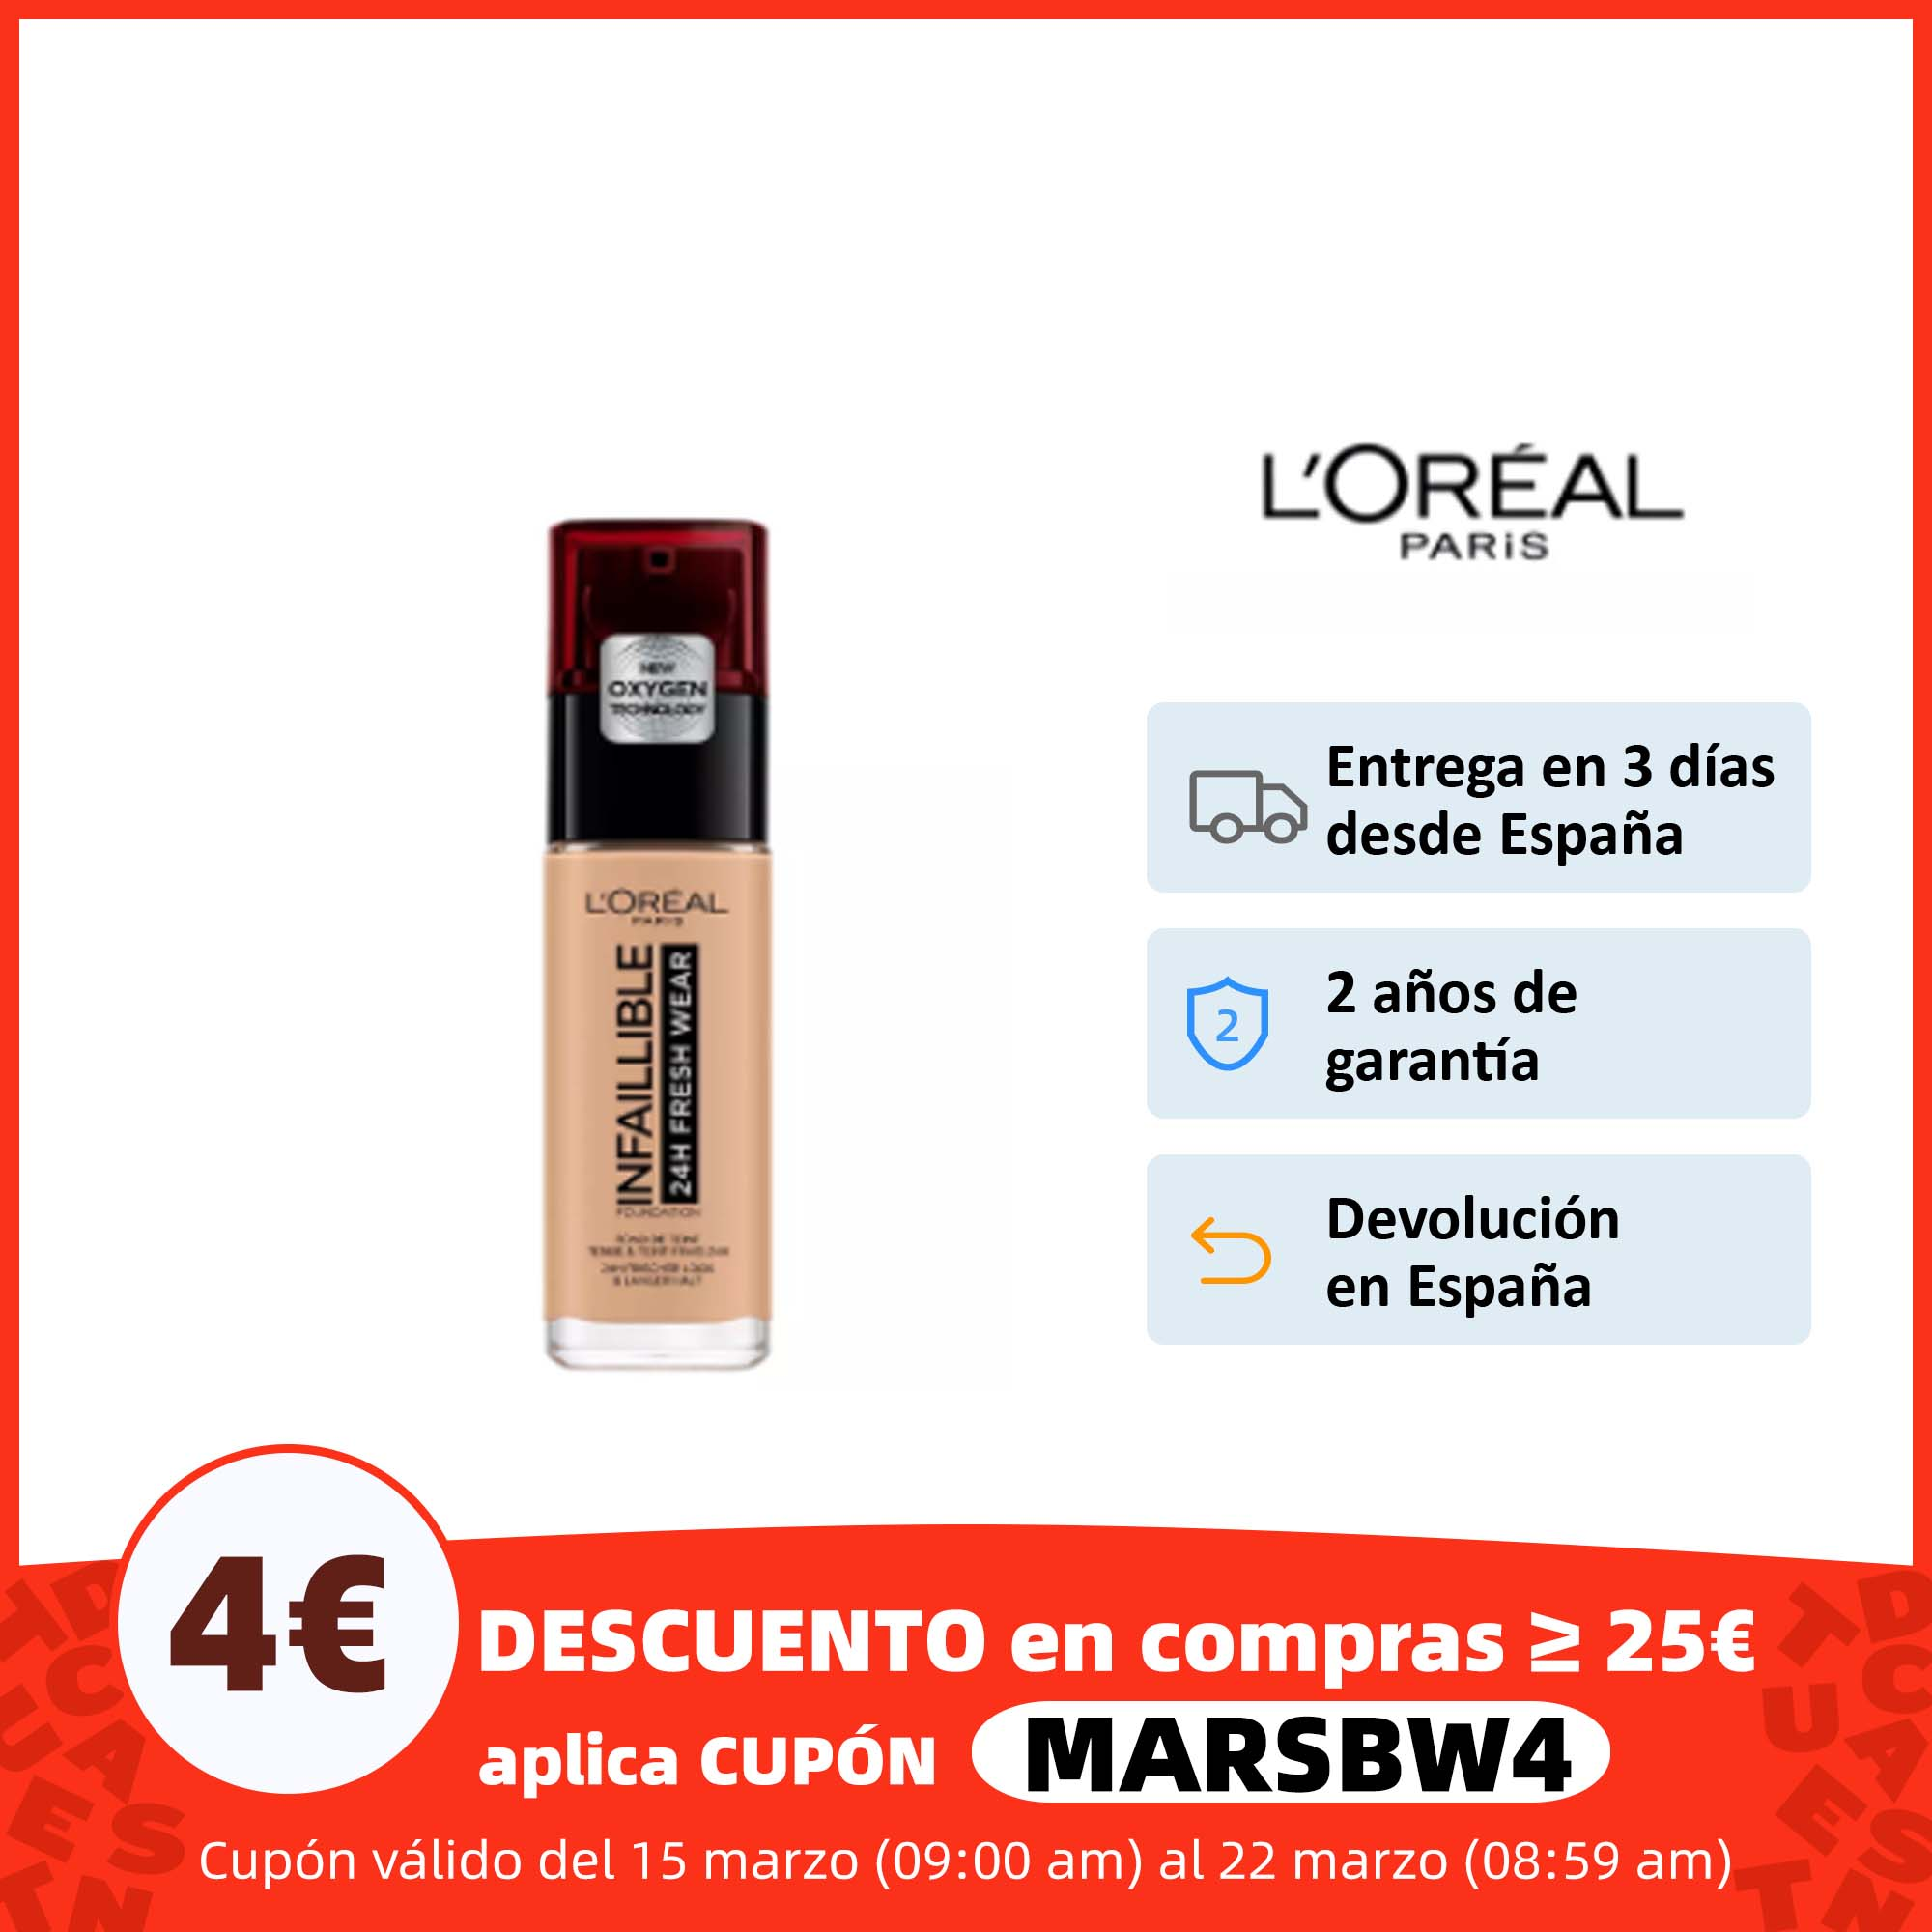 L'Oréal Paris Infalible 24H Fresh Wear Base Maquillaje de Larga Duración. Tonos 125, 200, 140 , 230, 130, 220, 300 y 225 30 ml Base de maquillaje  - AliExpress